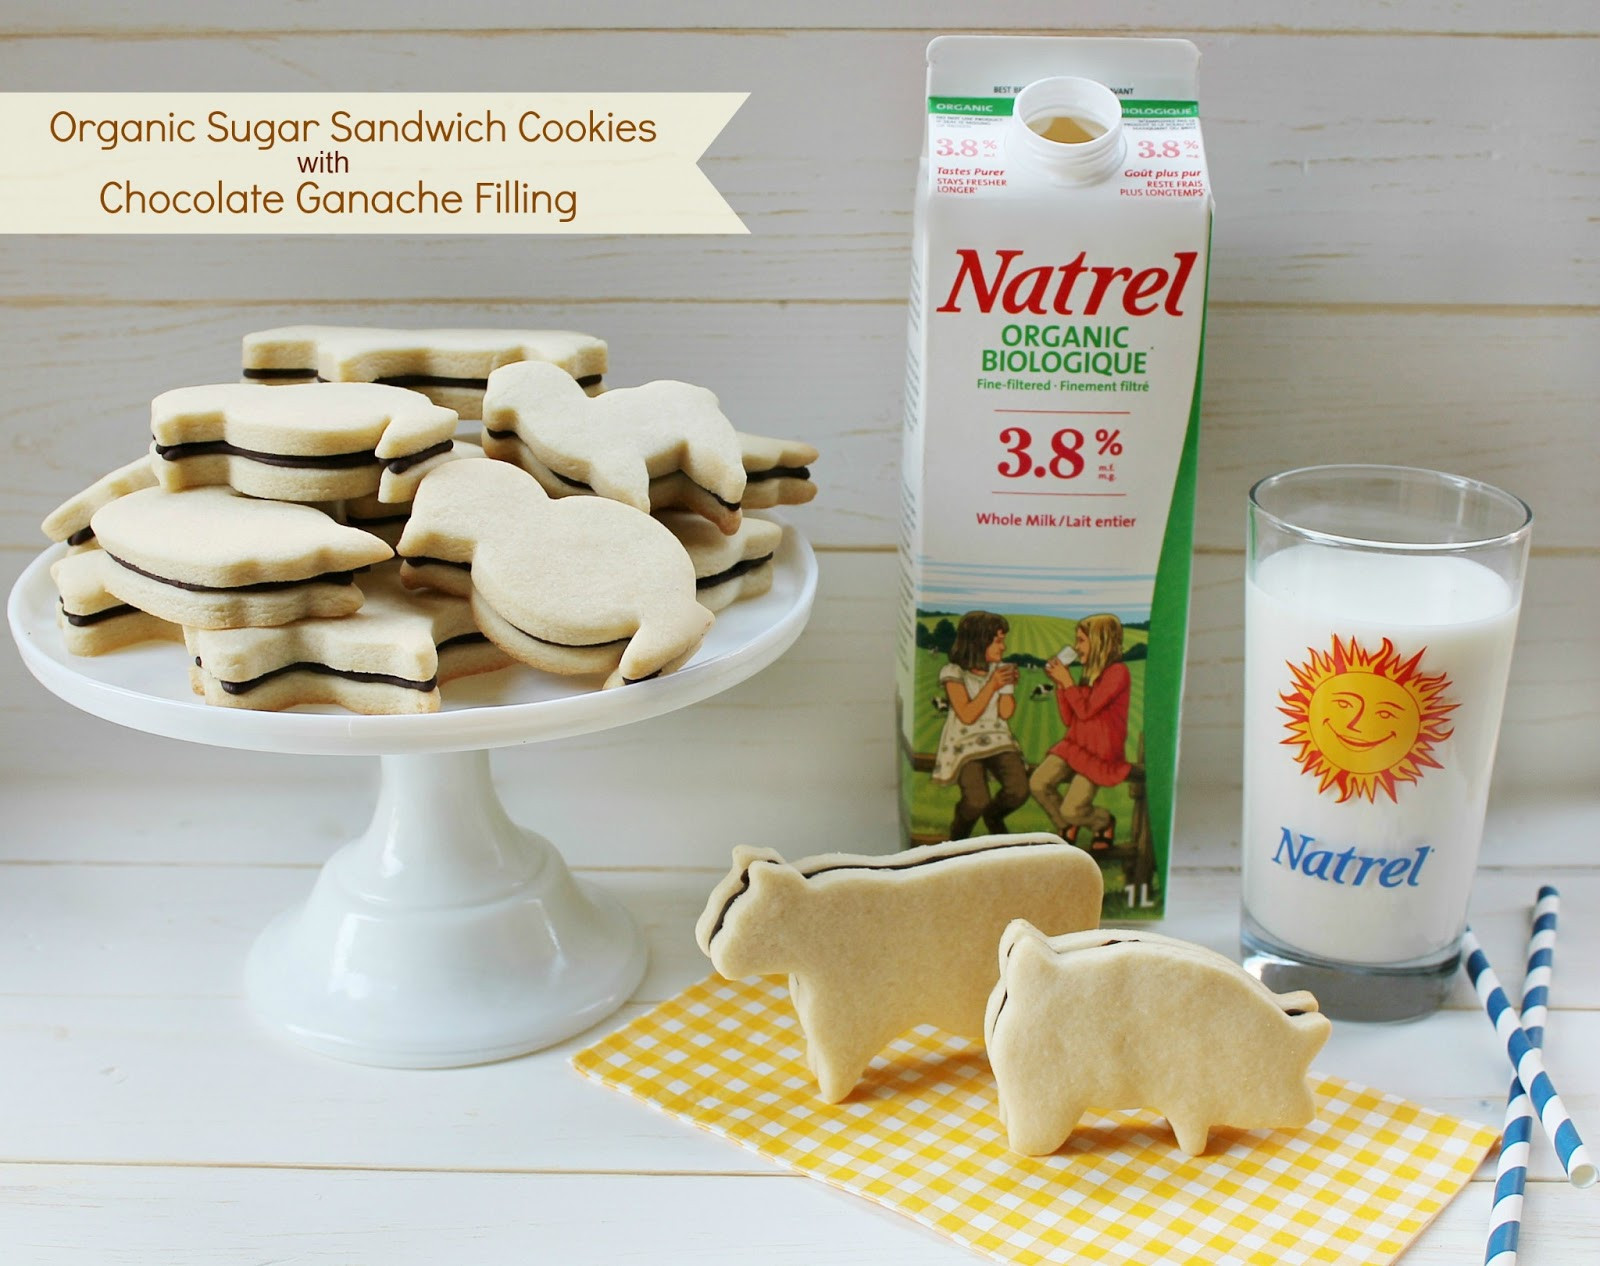 Organic Sugar Cookies  Organic Sugar Sandwich Cookies with Chocolate Ganache